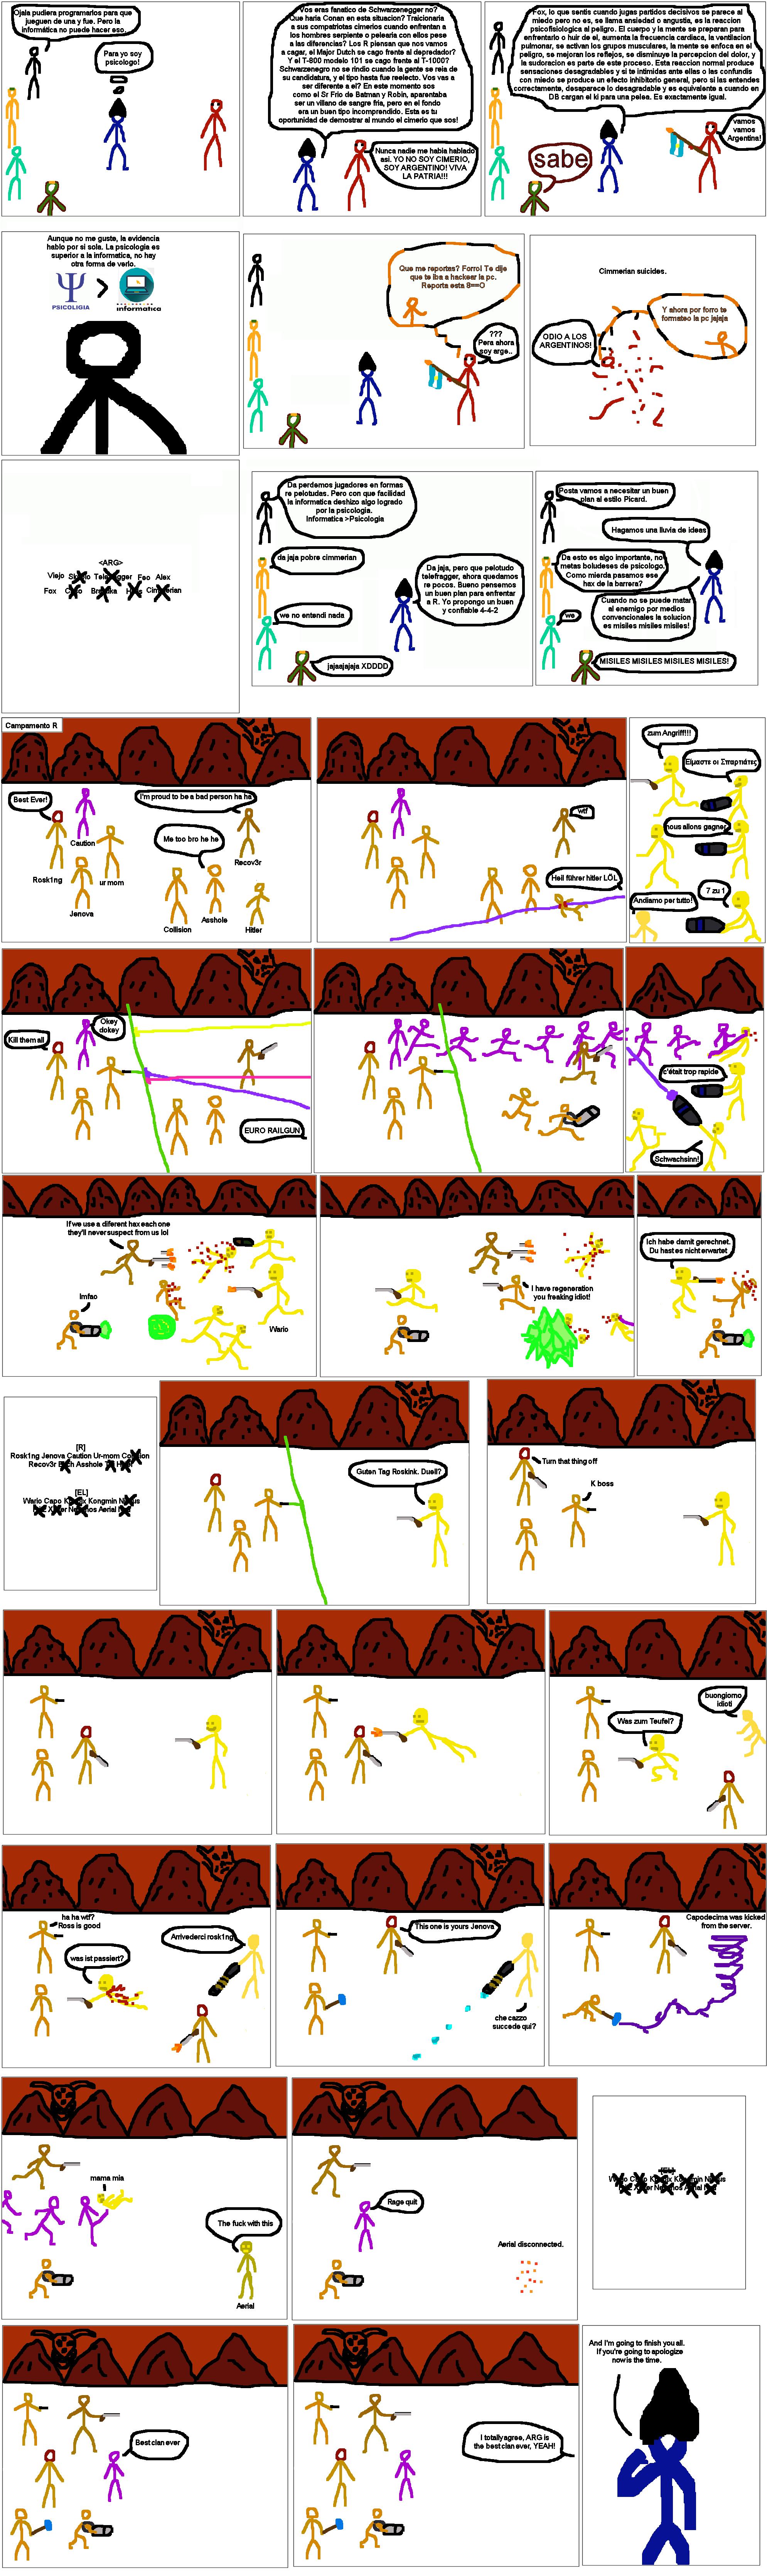 Historieta torneo tlms dragonbolero Pagina_7